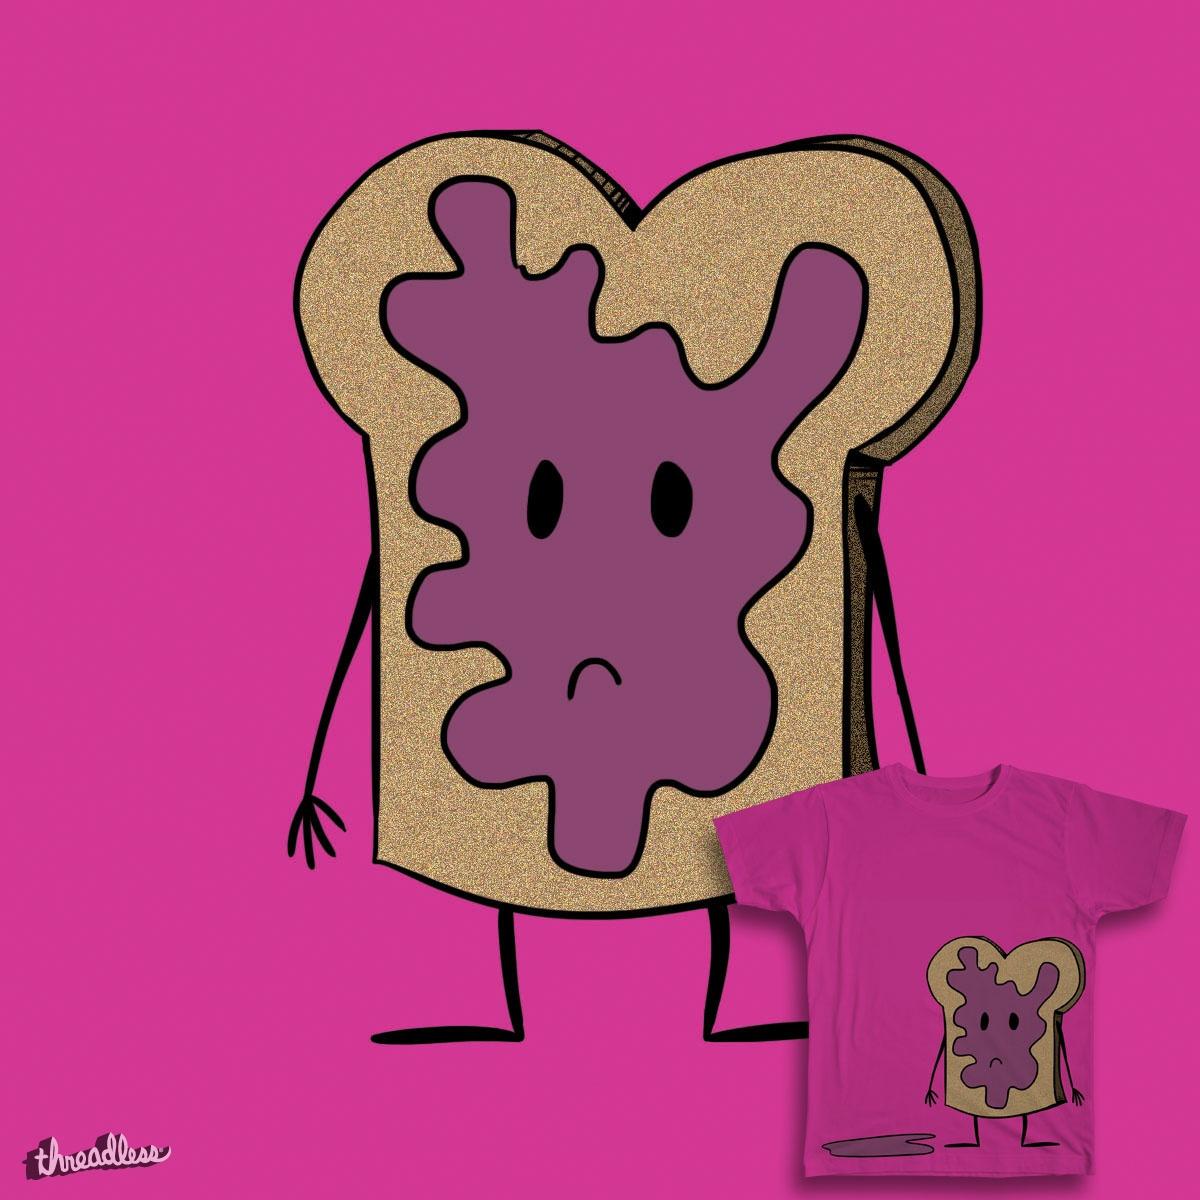 Jelly Toast by jedfras on Threadless